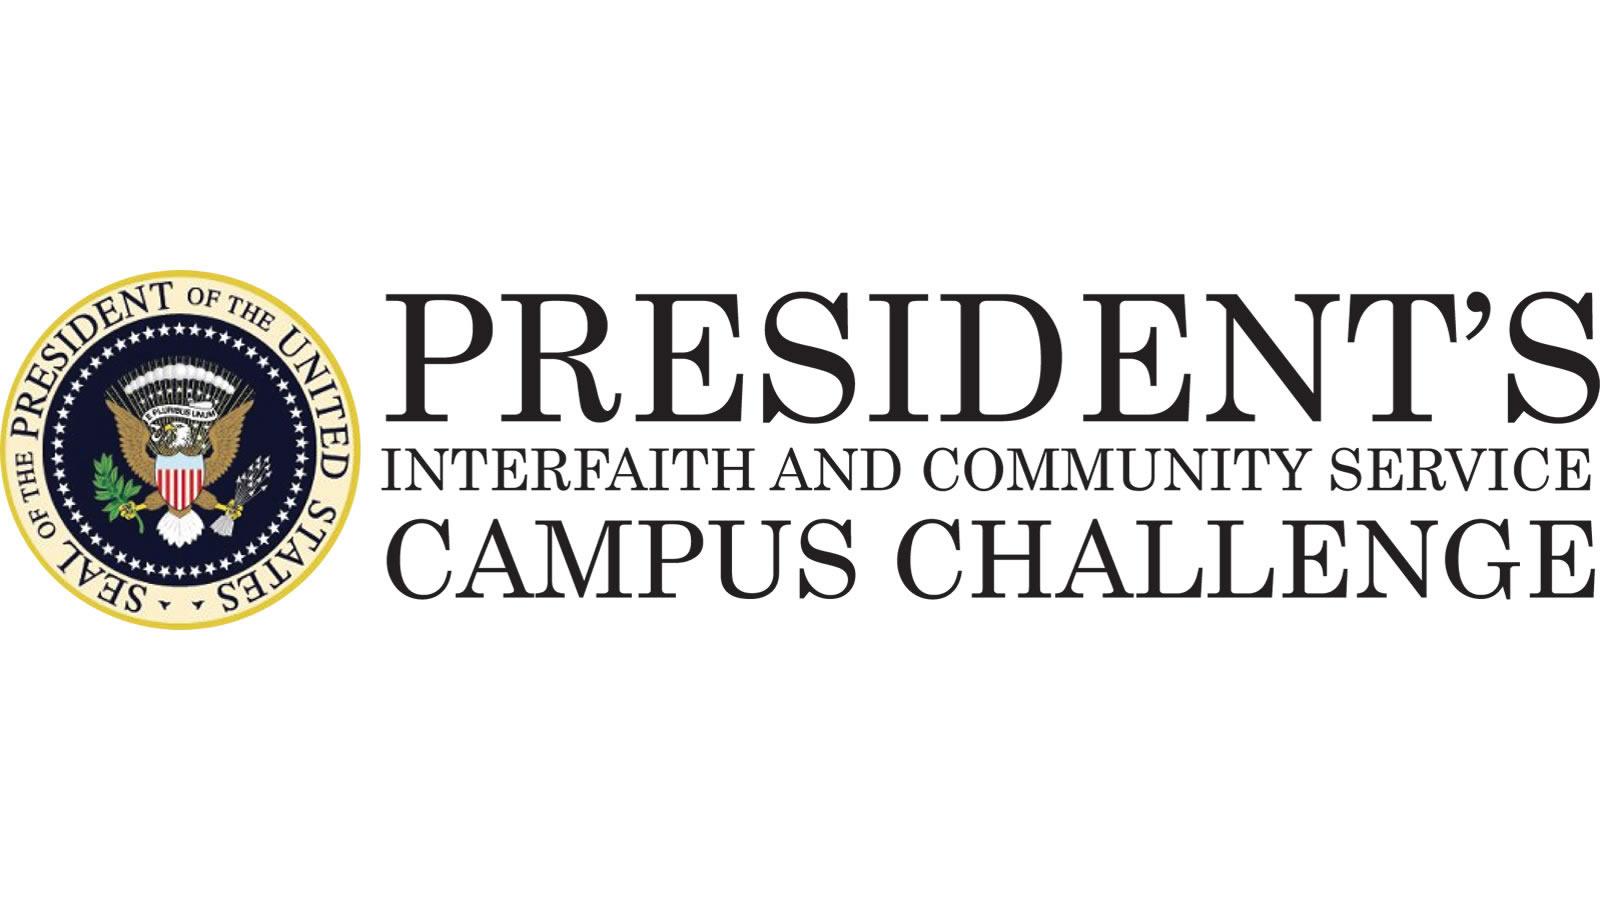 PresidentsInterfaithCommunityServiceCampusChallenge_landscape.jpg